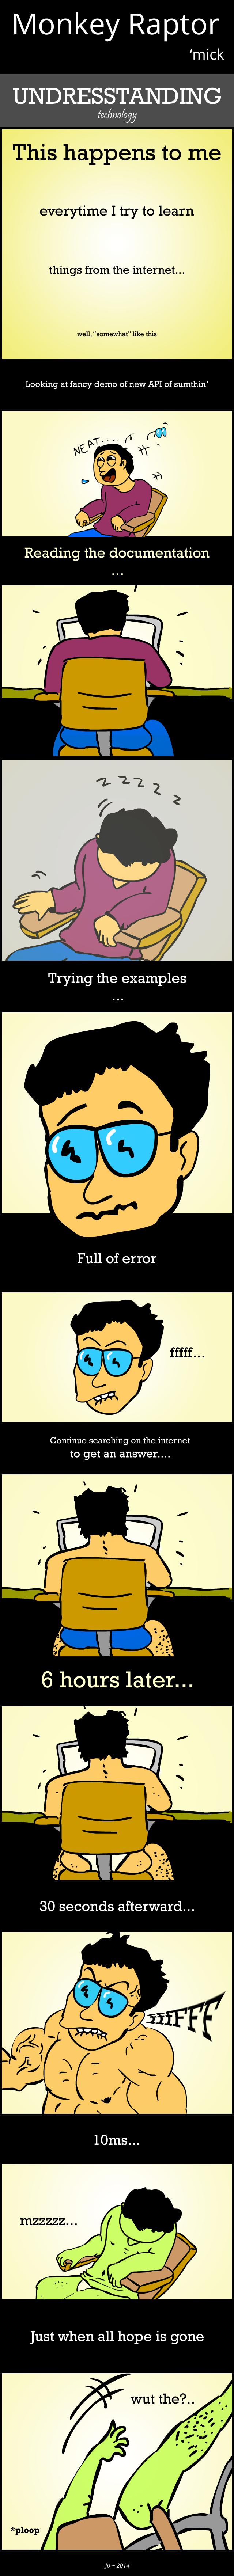 Monkey Raptor comic strip : Undresstanding Technology